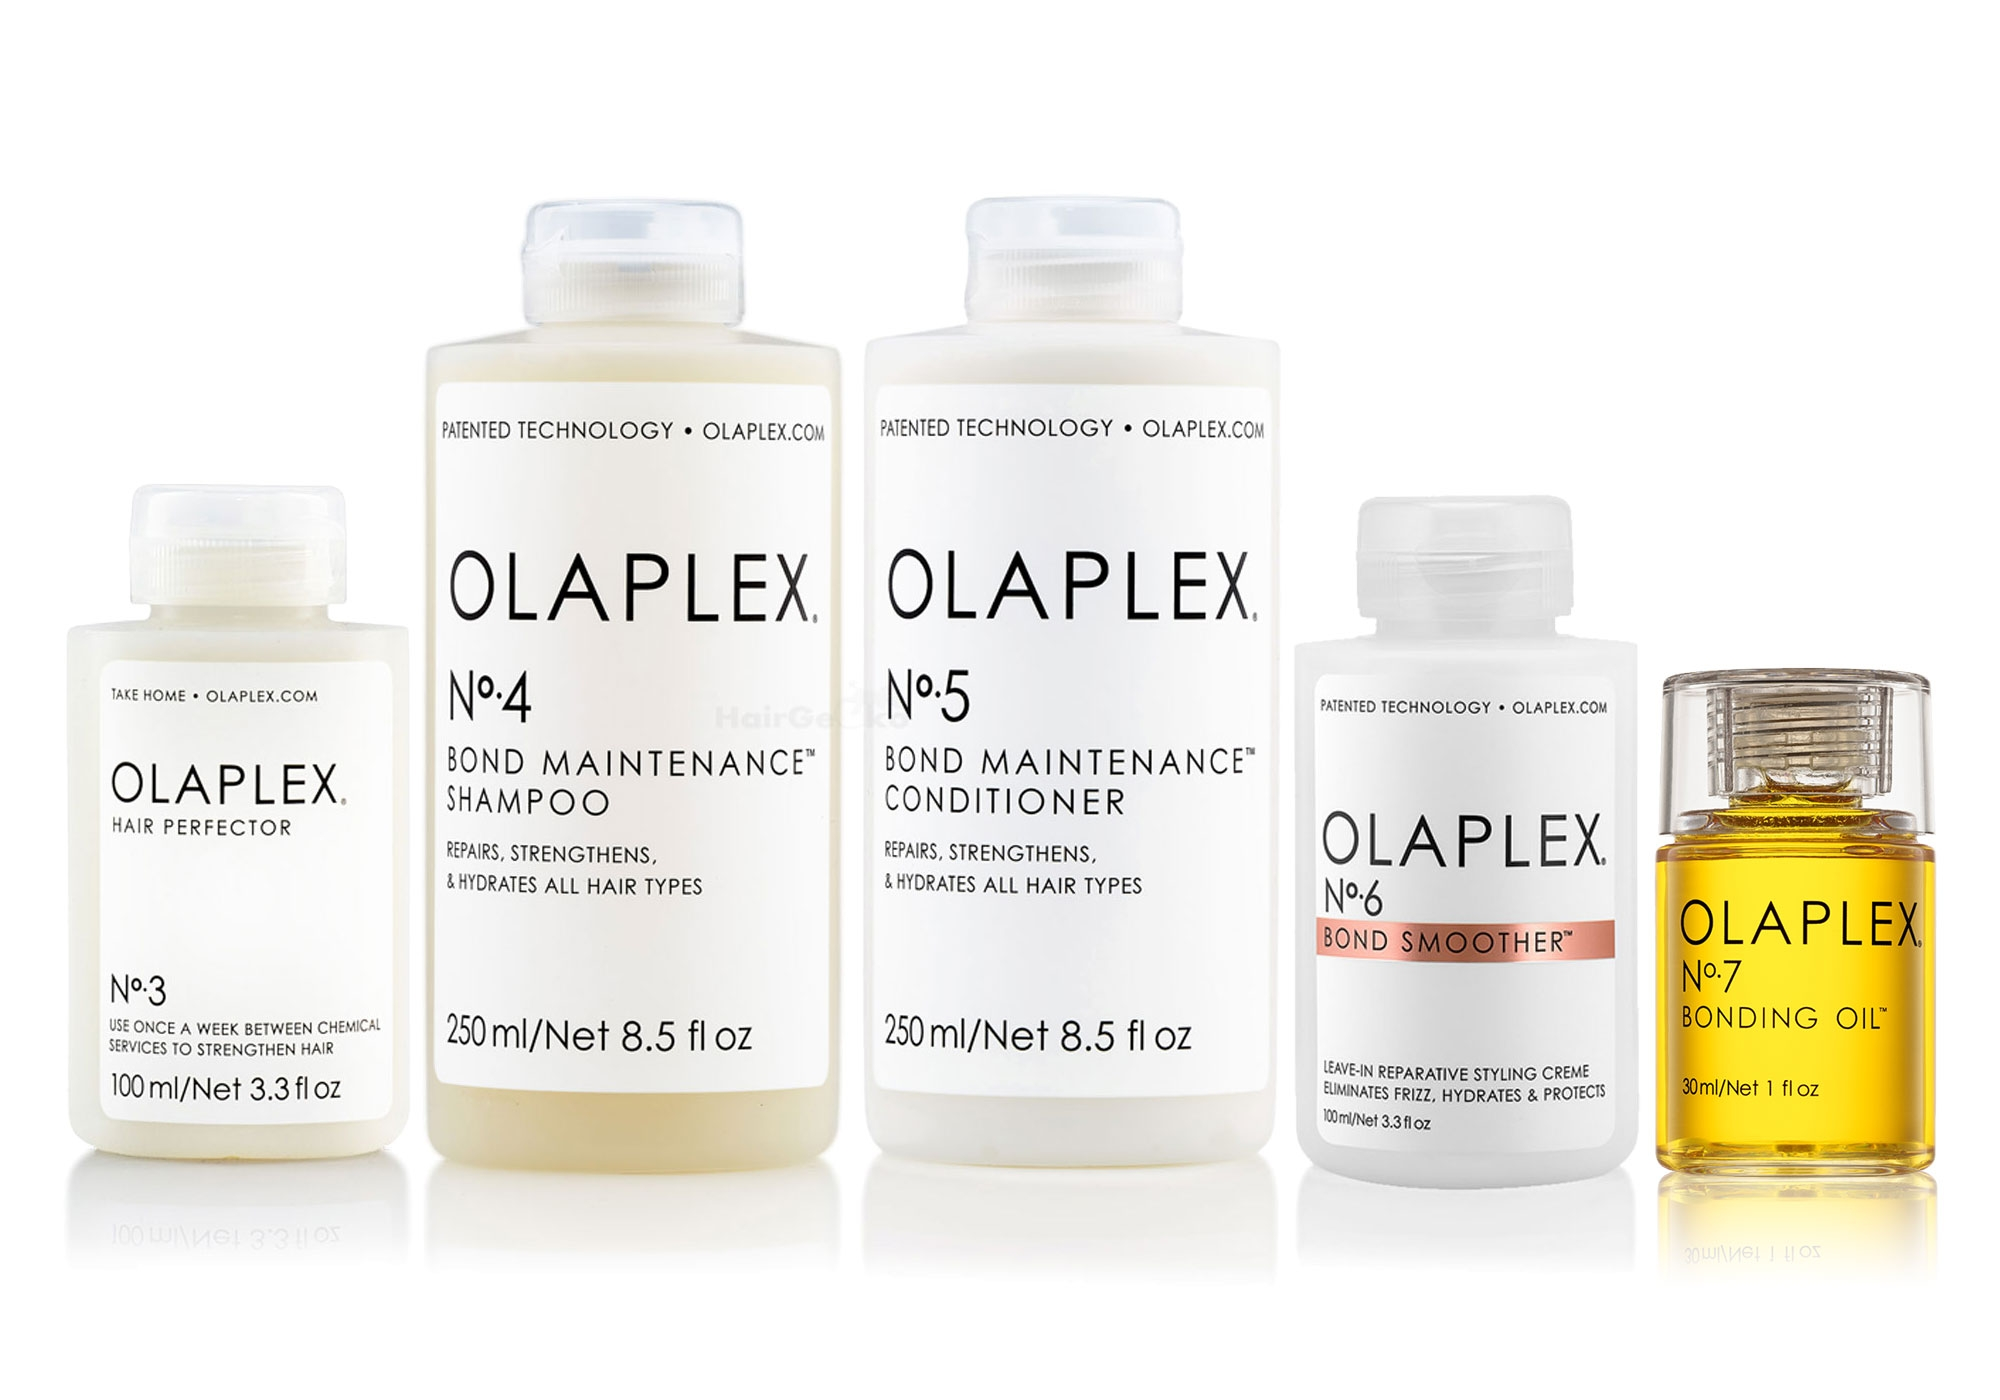 Olaplex Set - Olaplex Bond Maintenance Shampoo No 4 (250ml) + Olaplex Bond Maintenance Conditioner No 5 (250ml) + Olaplex Hair Perfector No 3 (100ml) + Olaplex Bond Smoother No 6 (100ml) + Olaplex Bonding Oil No 7 (30ml)